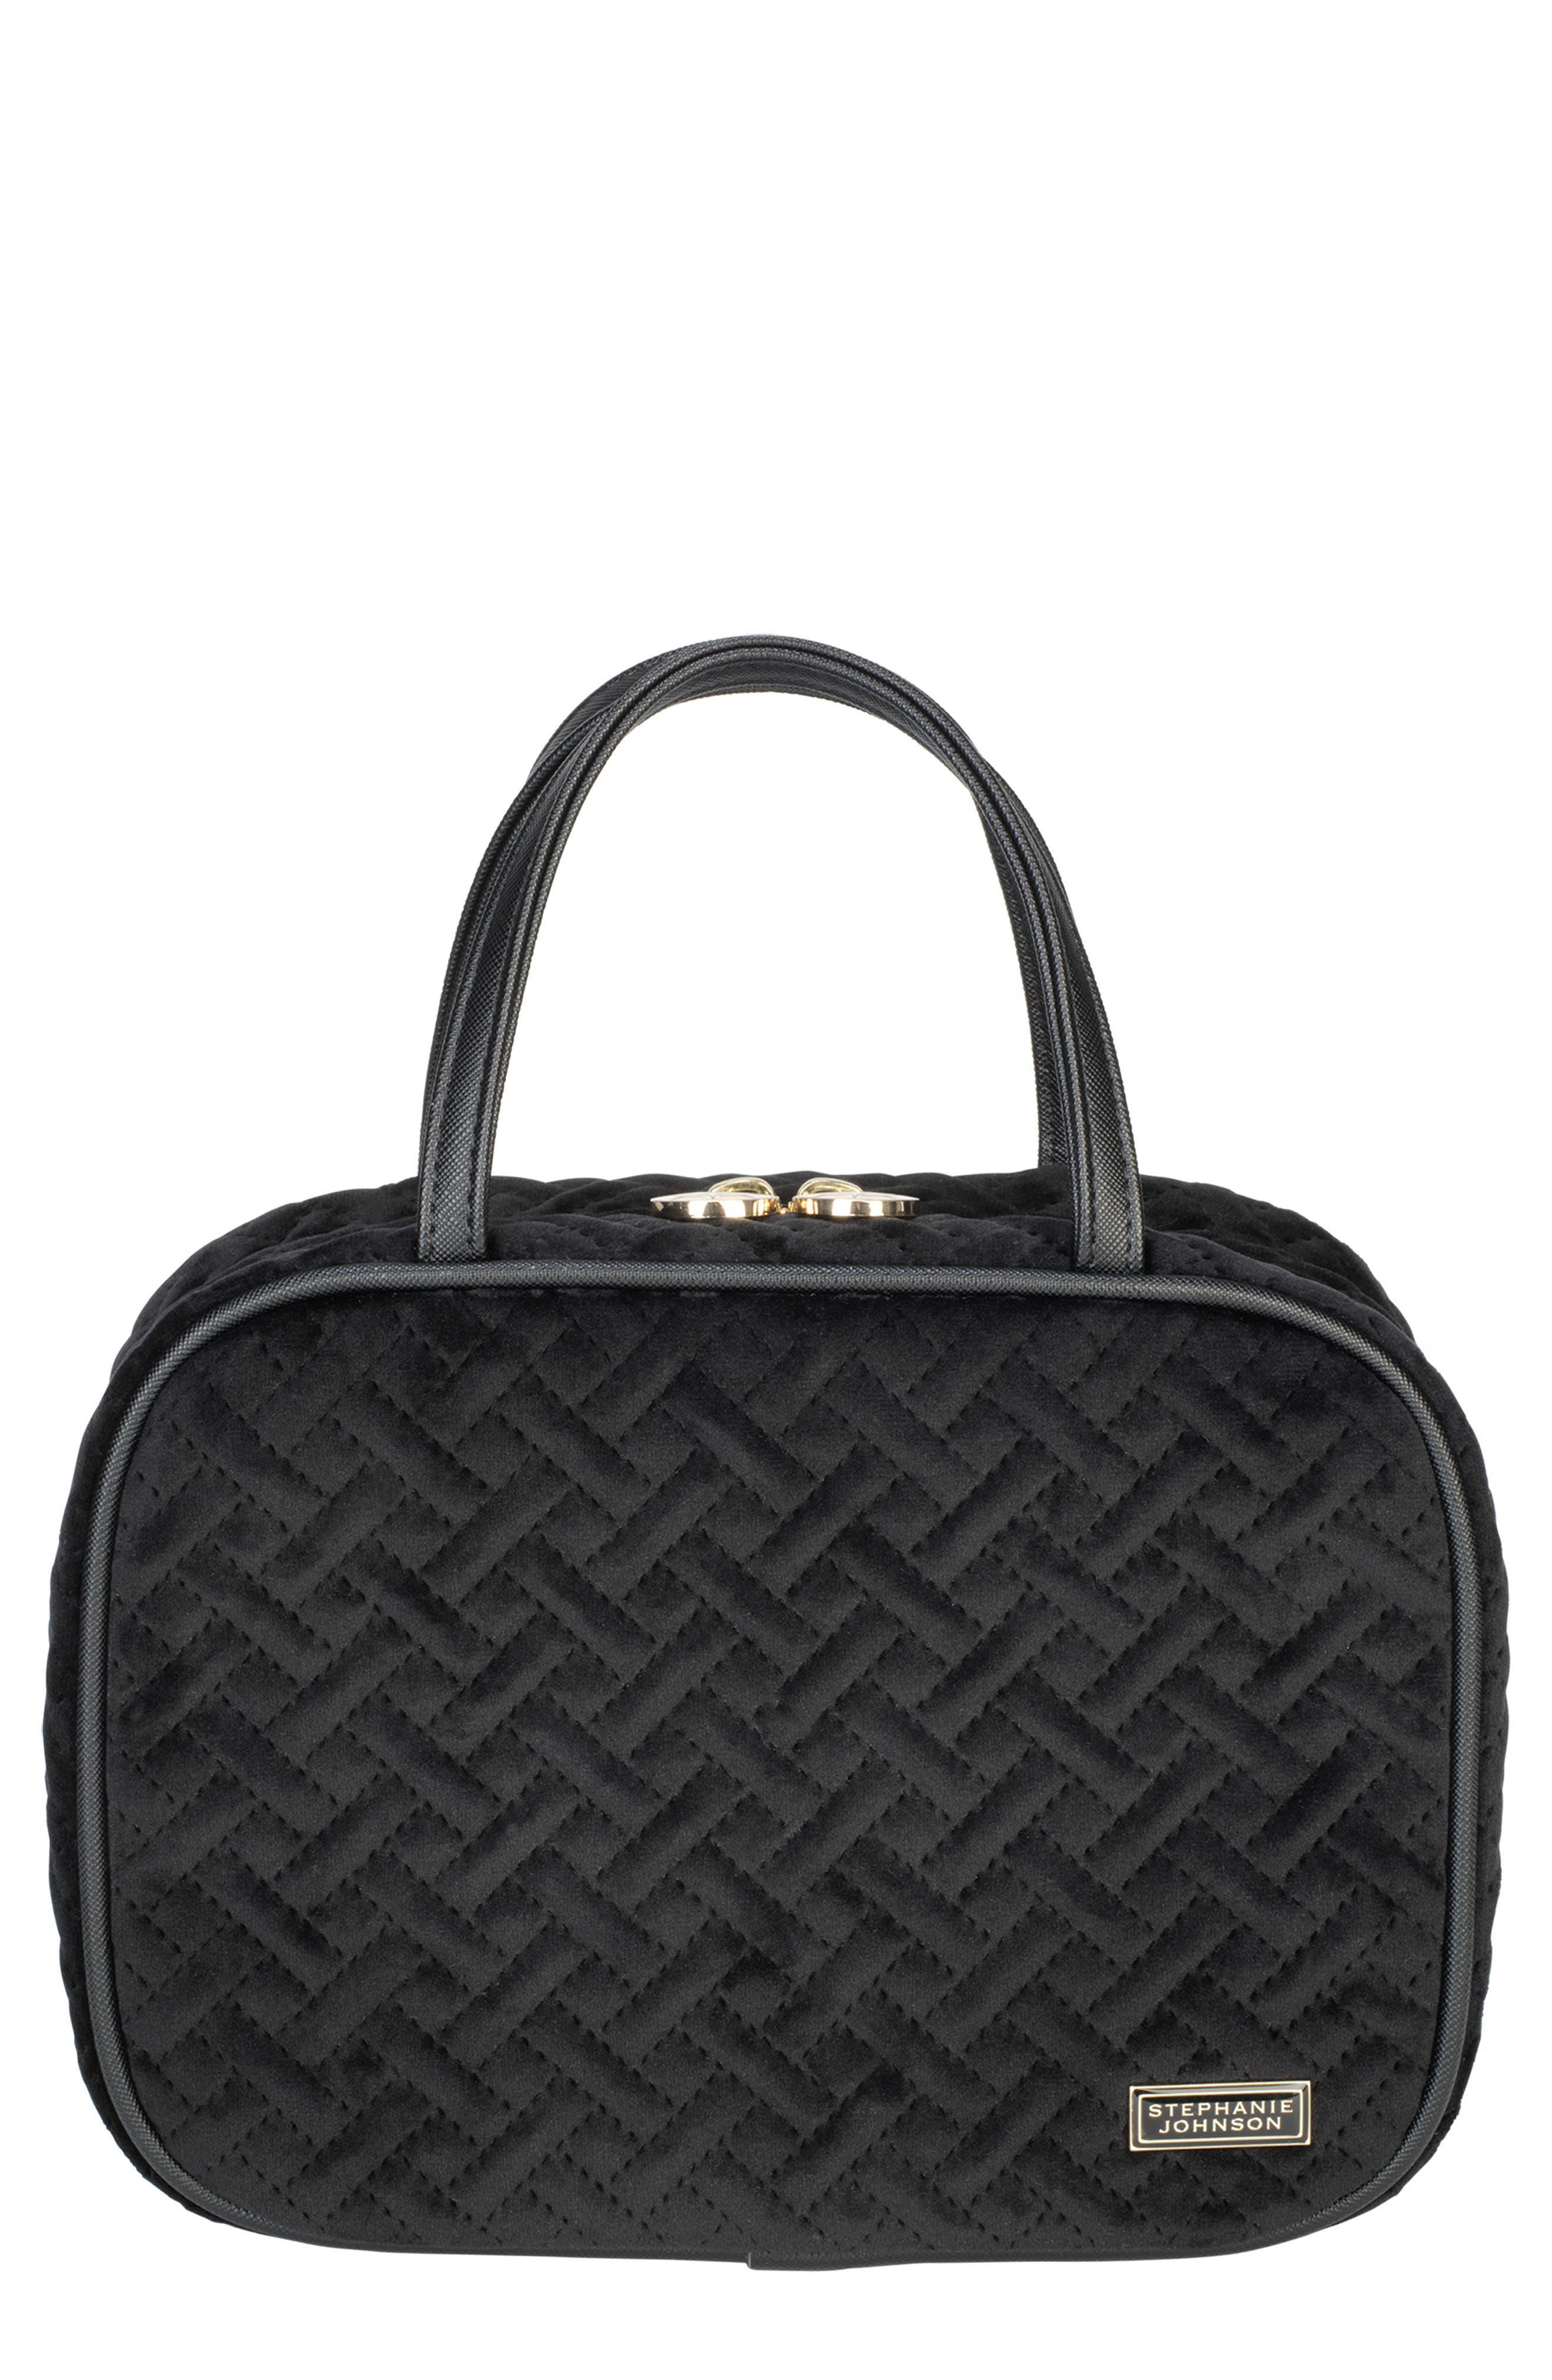 STEPHANIE JOHNSON Milan Black Ml Traveler Cosmetics Case